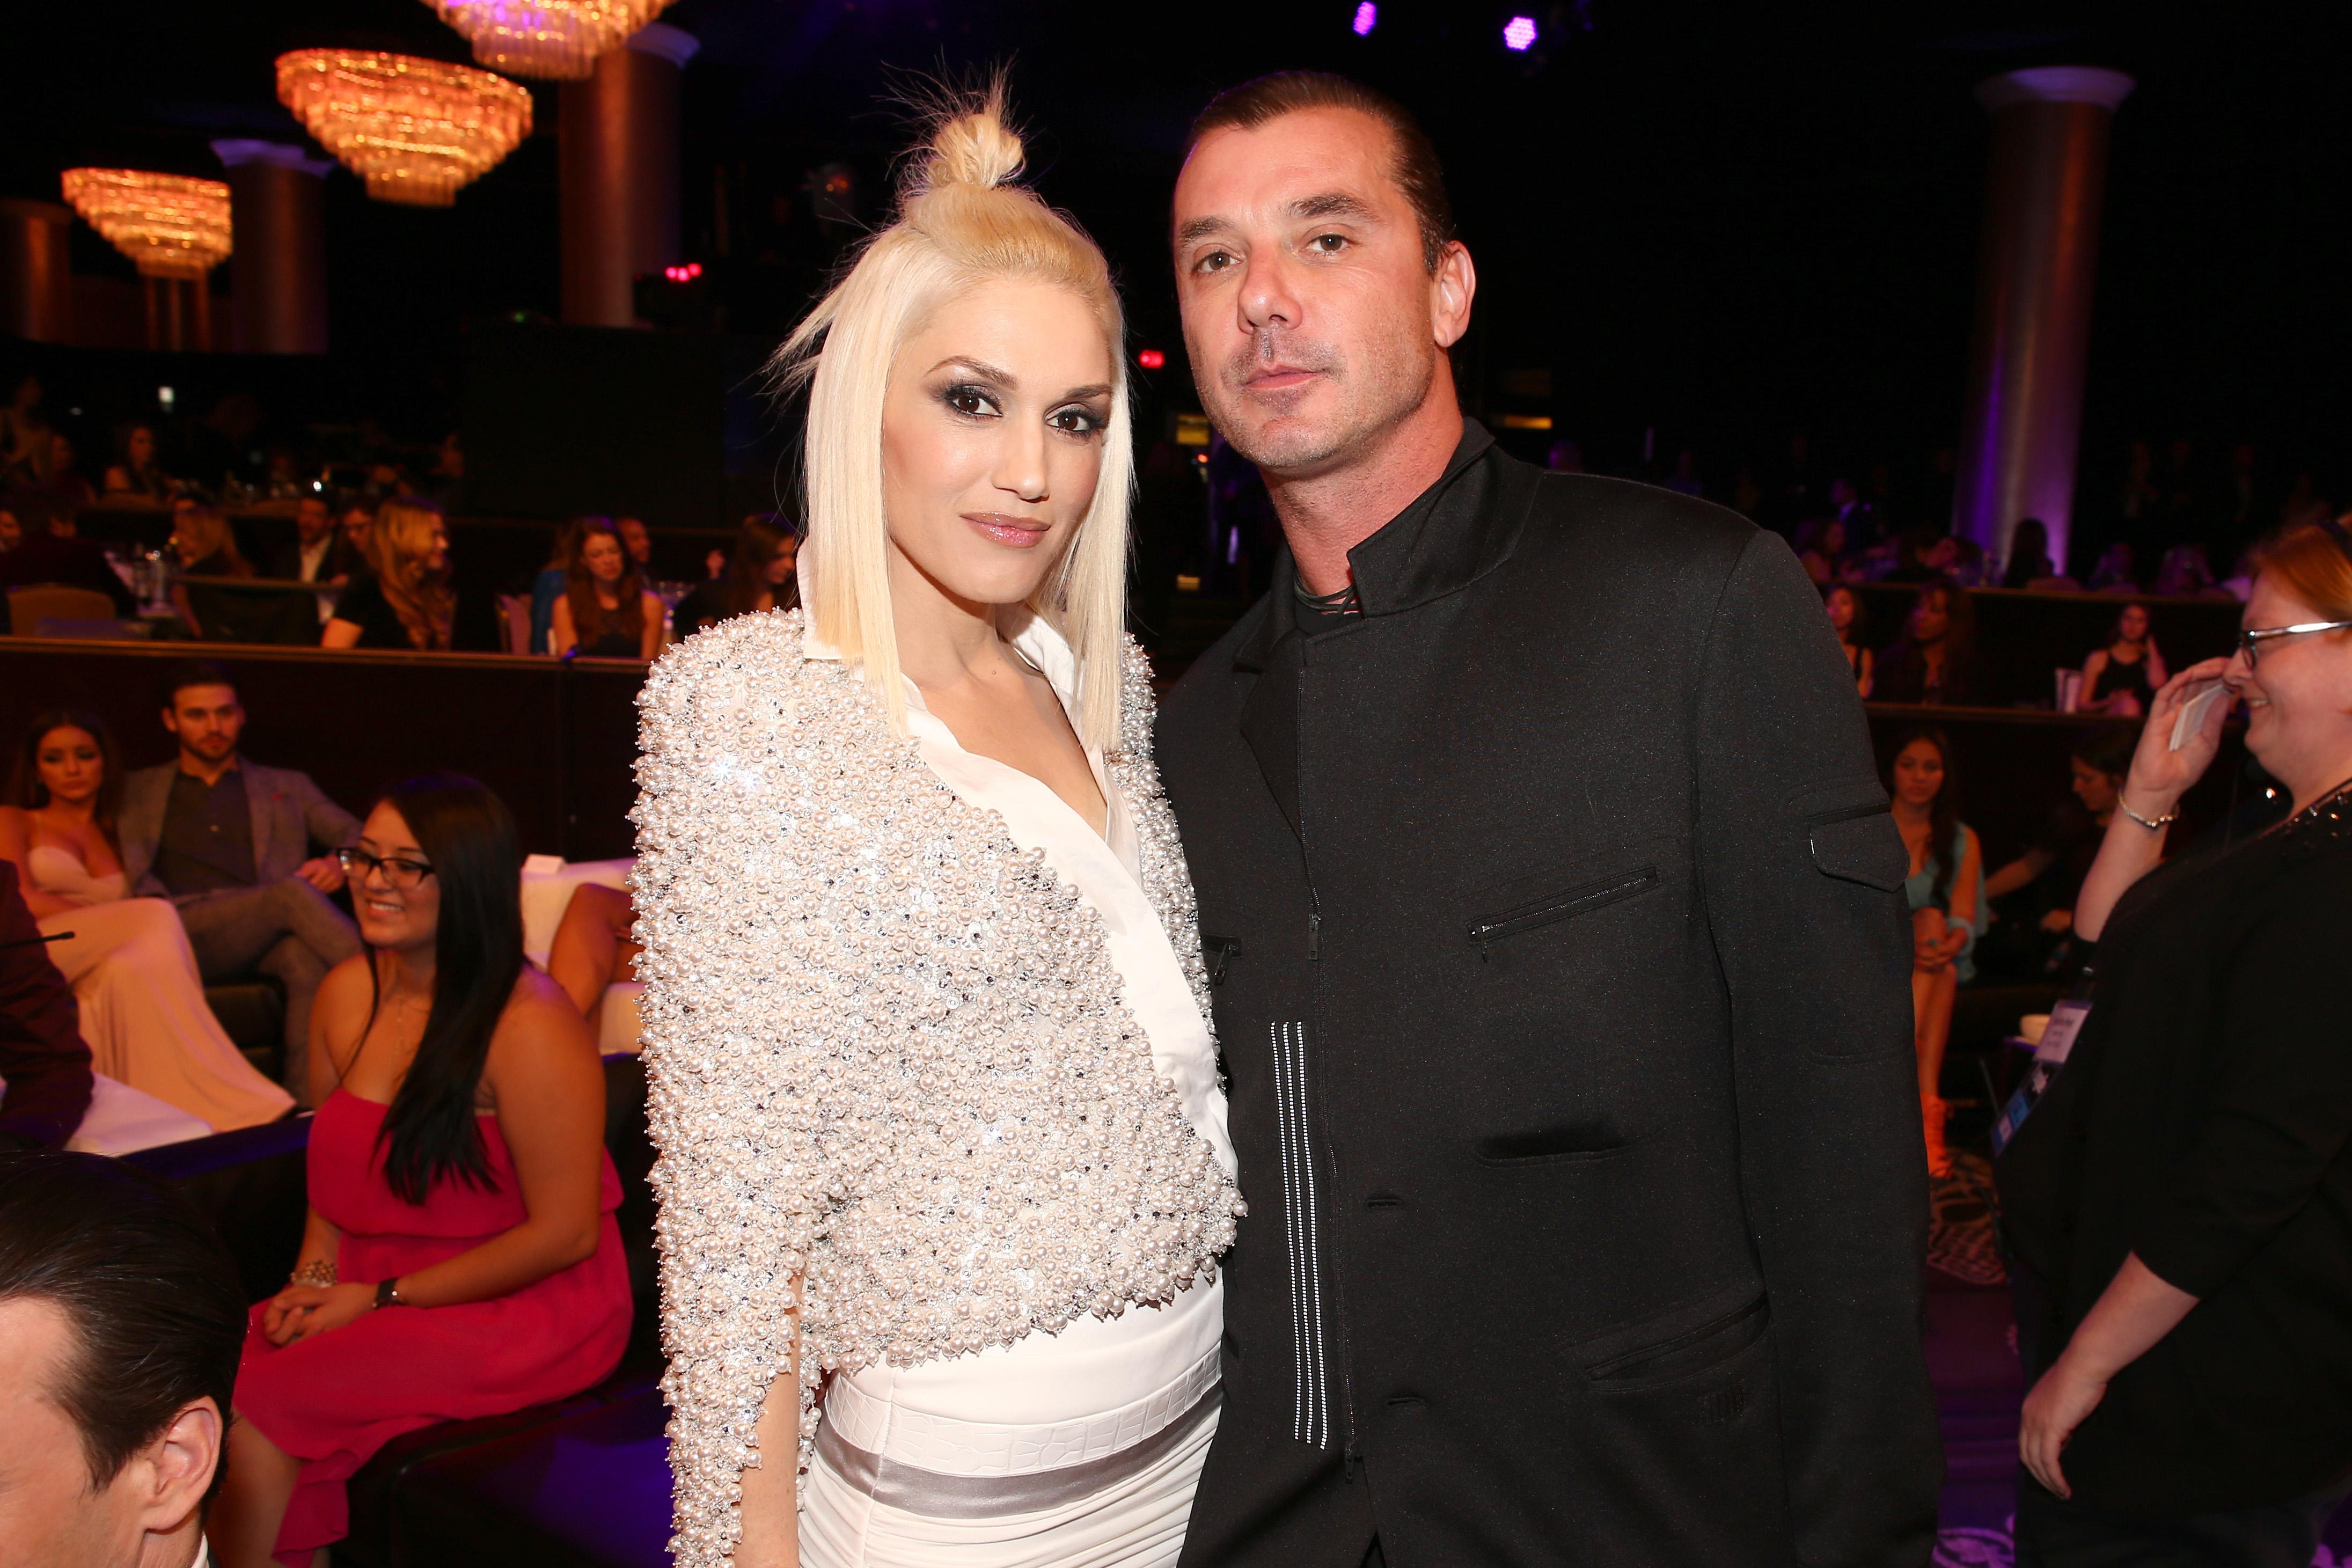 Did-Gavin-Rossdale-Cheat-On-Gwen-Stefani-With-Their-Nanny